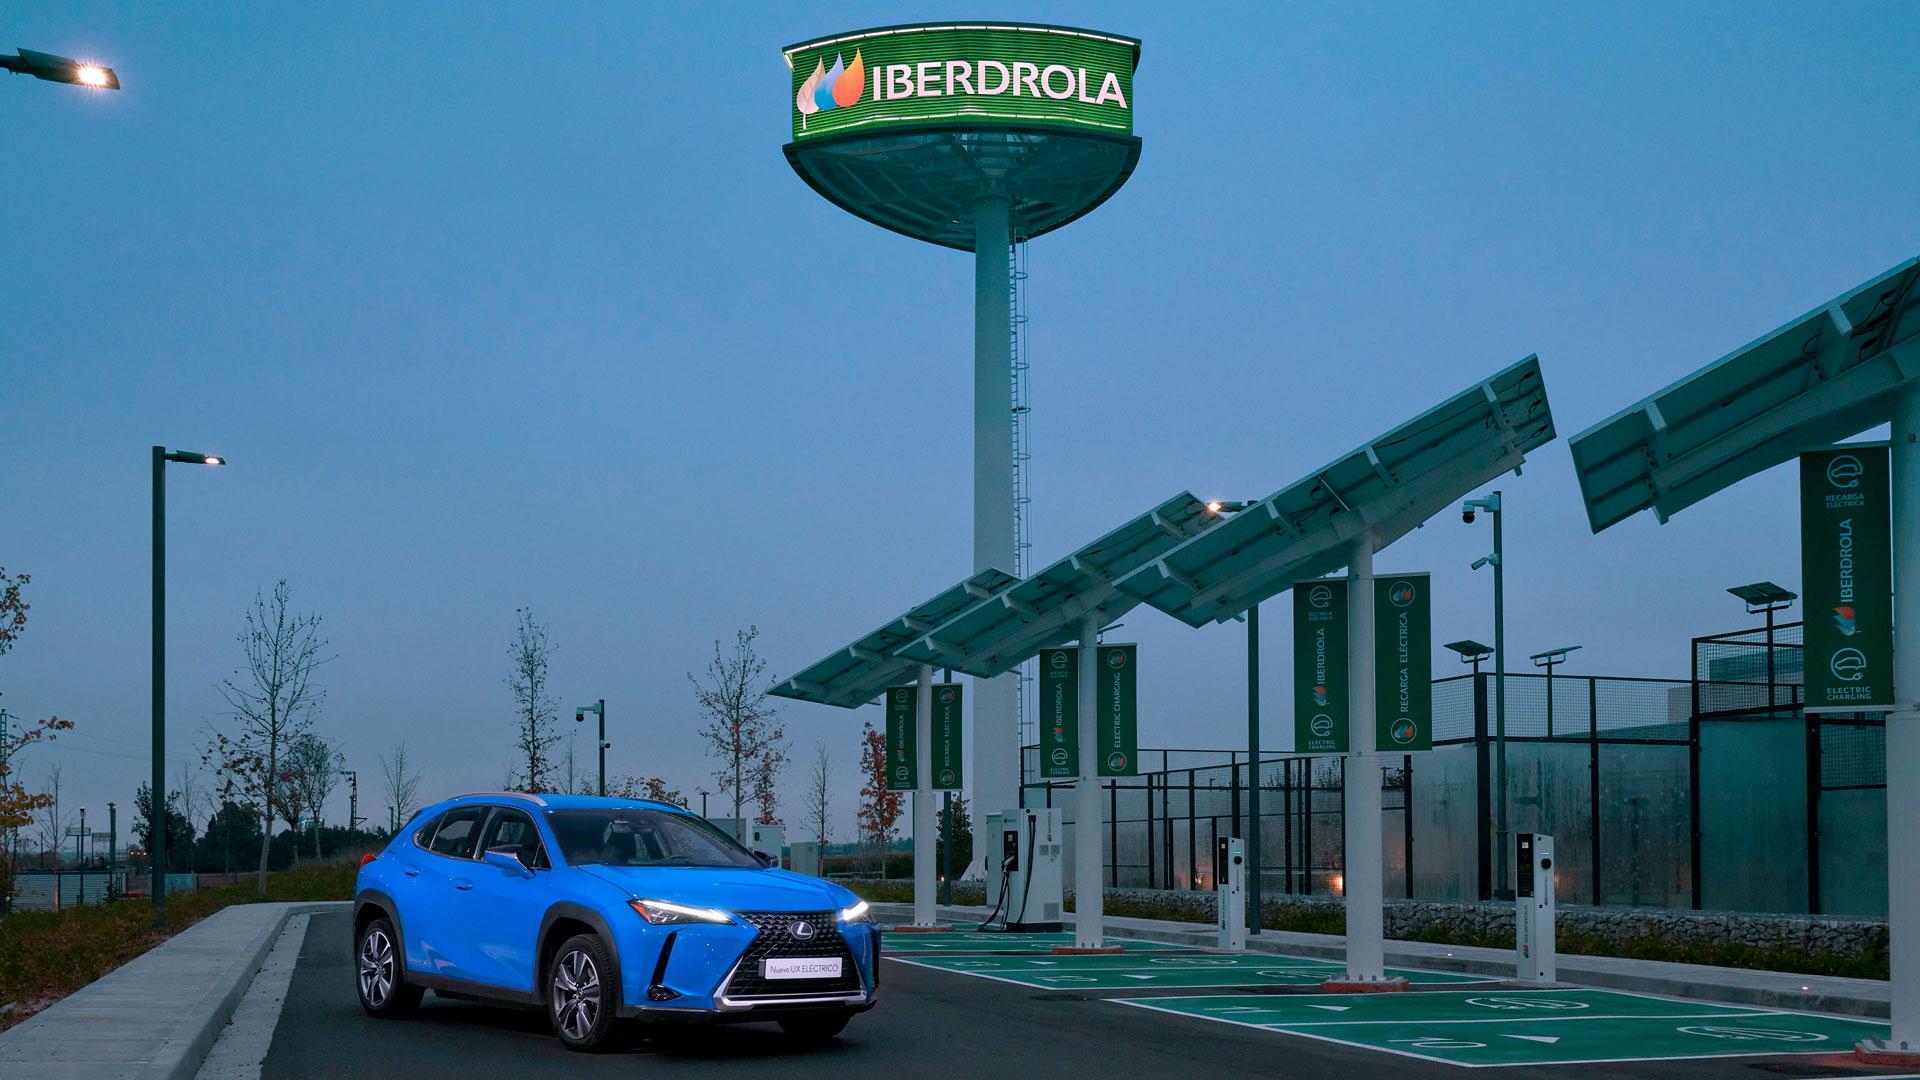 Imagen de Lexus frente a Iberdrola